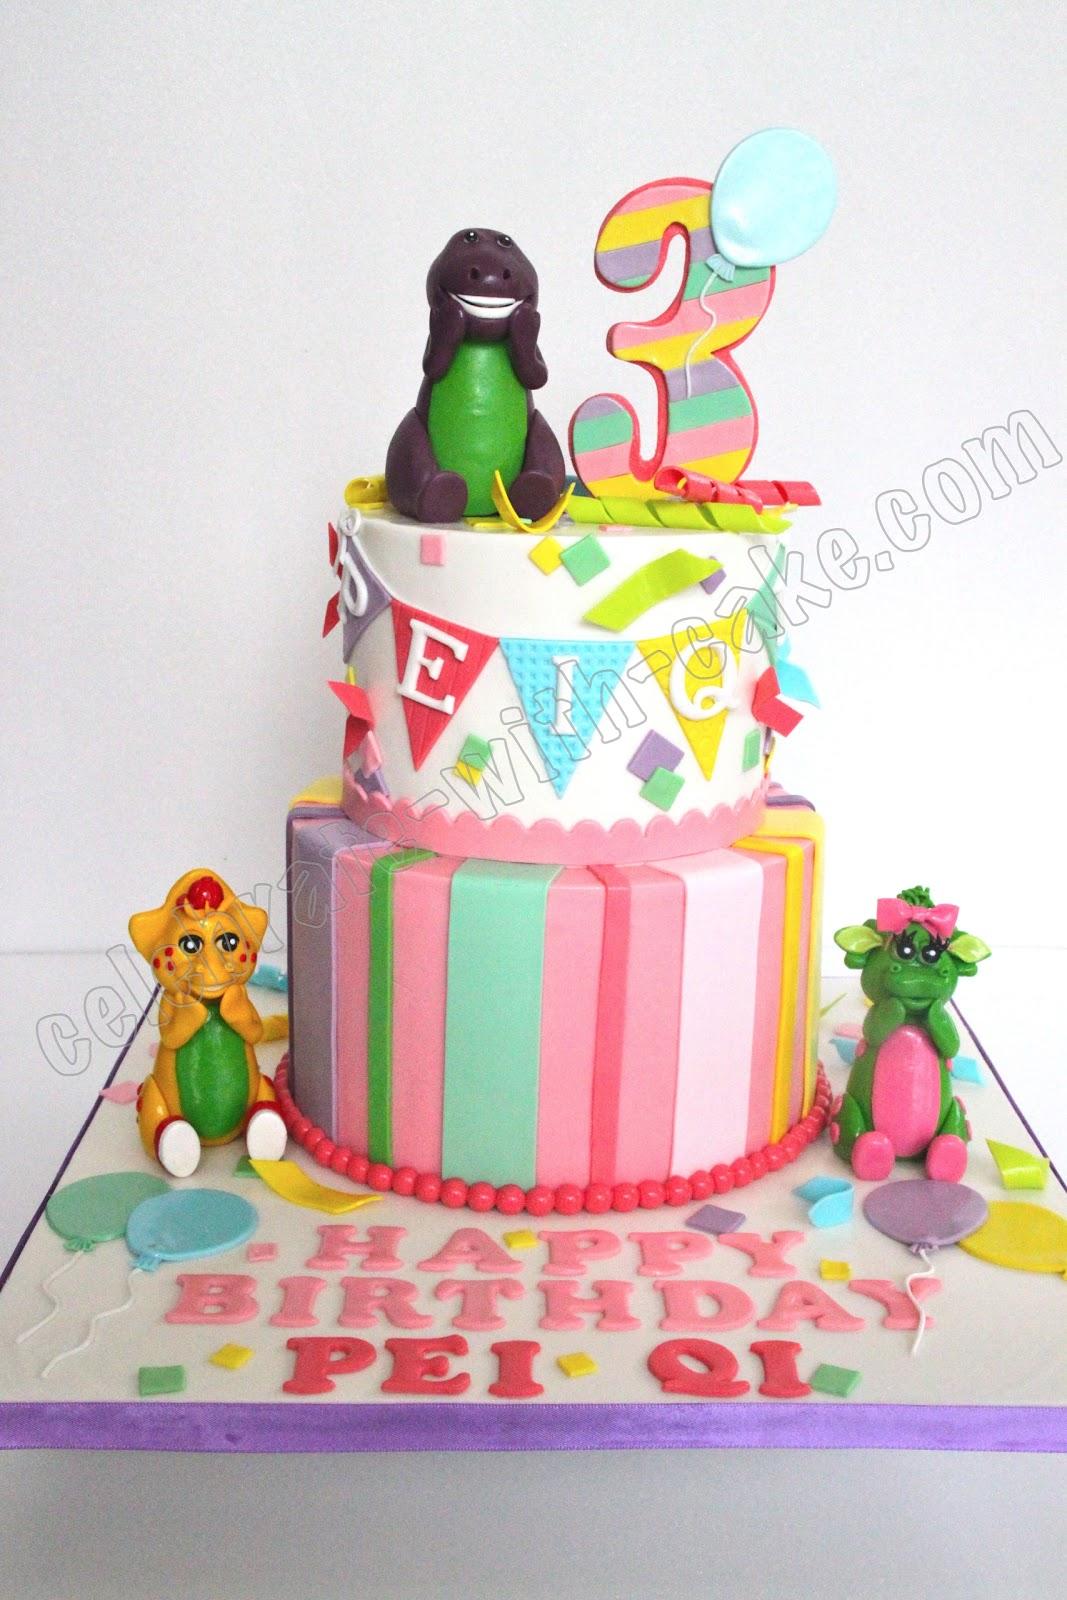 barney cake - photo #33